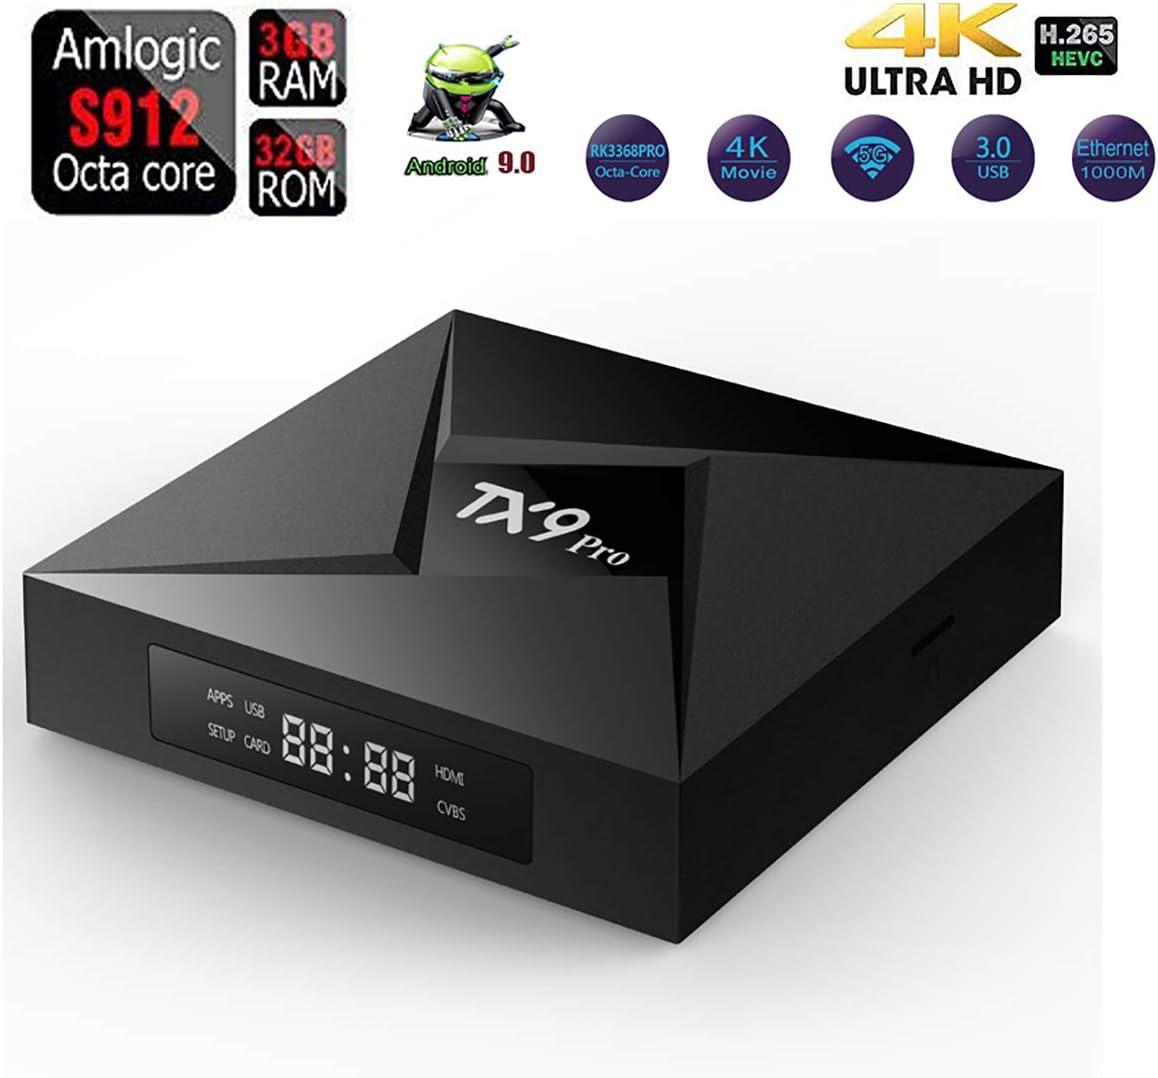 WXJHA TX9 Pro TV Box Octa-Core de 32 GB / 3GB DDR3 Bluetooth Android 7.1 Amlogic S9121080p 4K 3D de 2,4 GHz / 5.0 GHz de Doble WiFi Google Play Smart TV Box: Amazon.es: Hogar